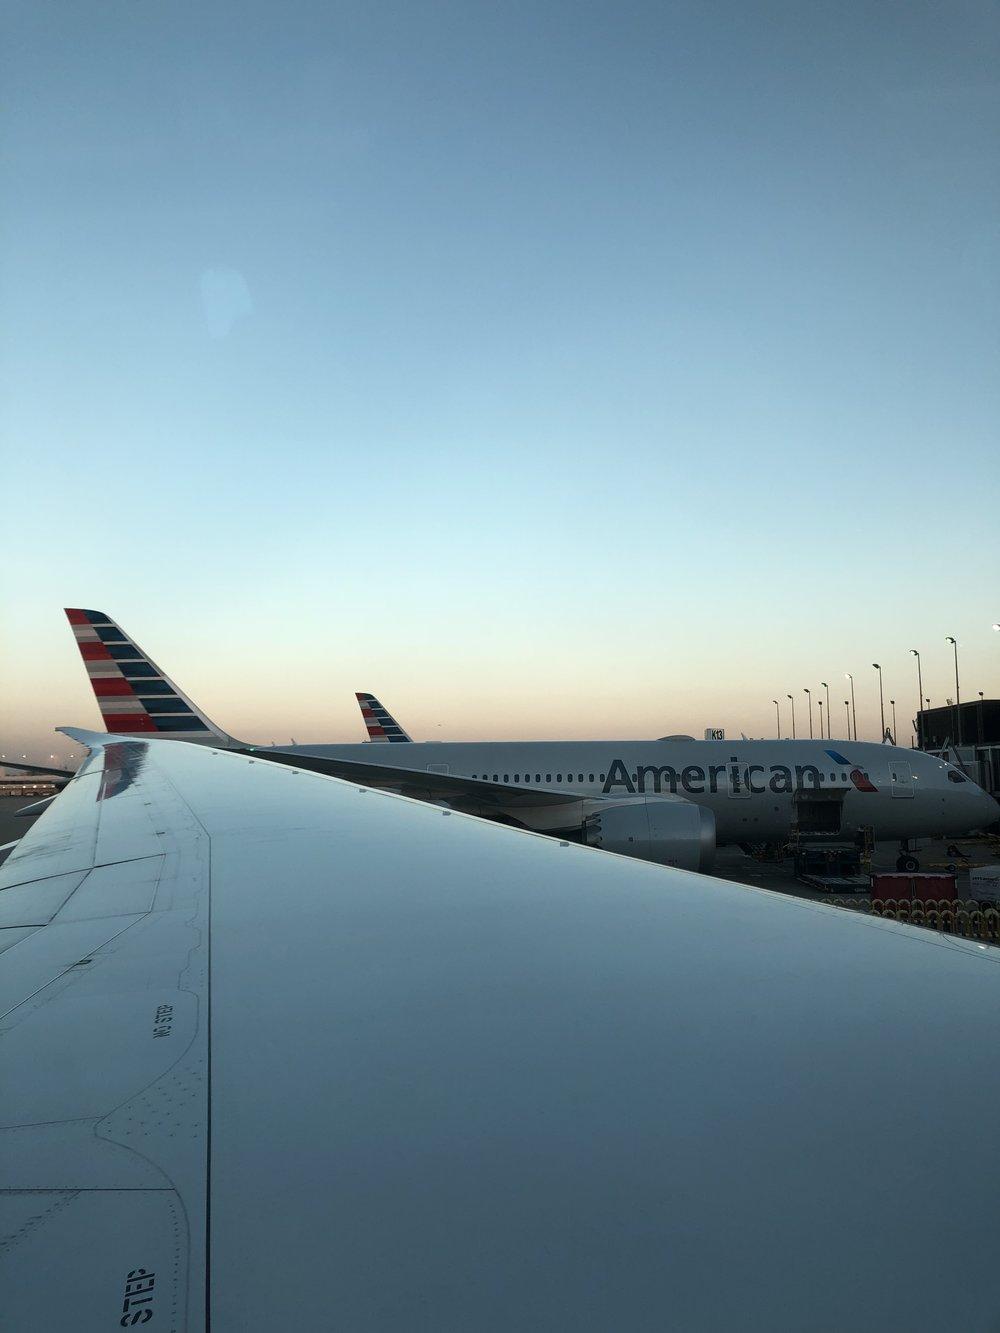 Ready to take off…